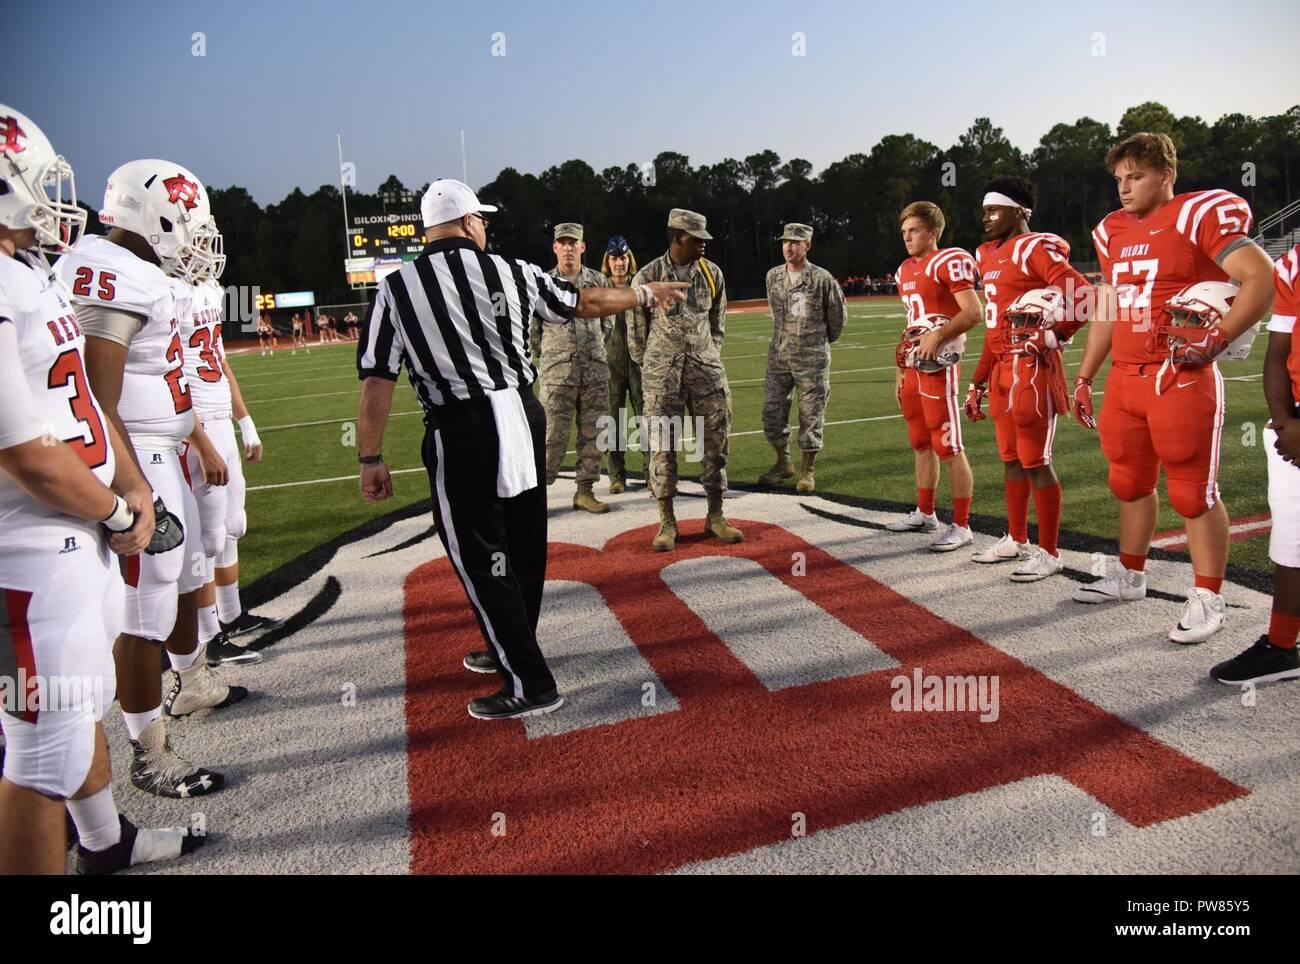 Biloxi High School Football High Resolution Stock Photography And